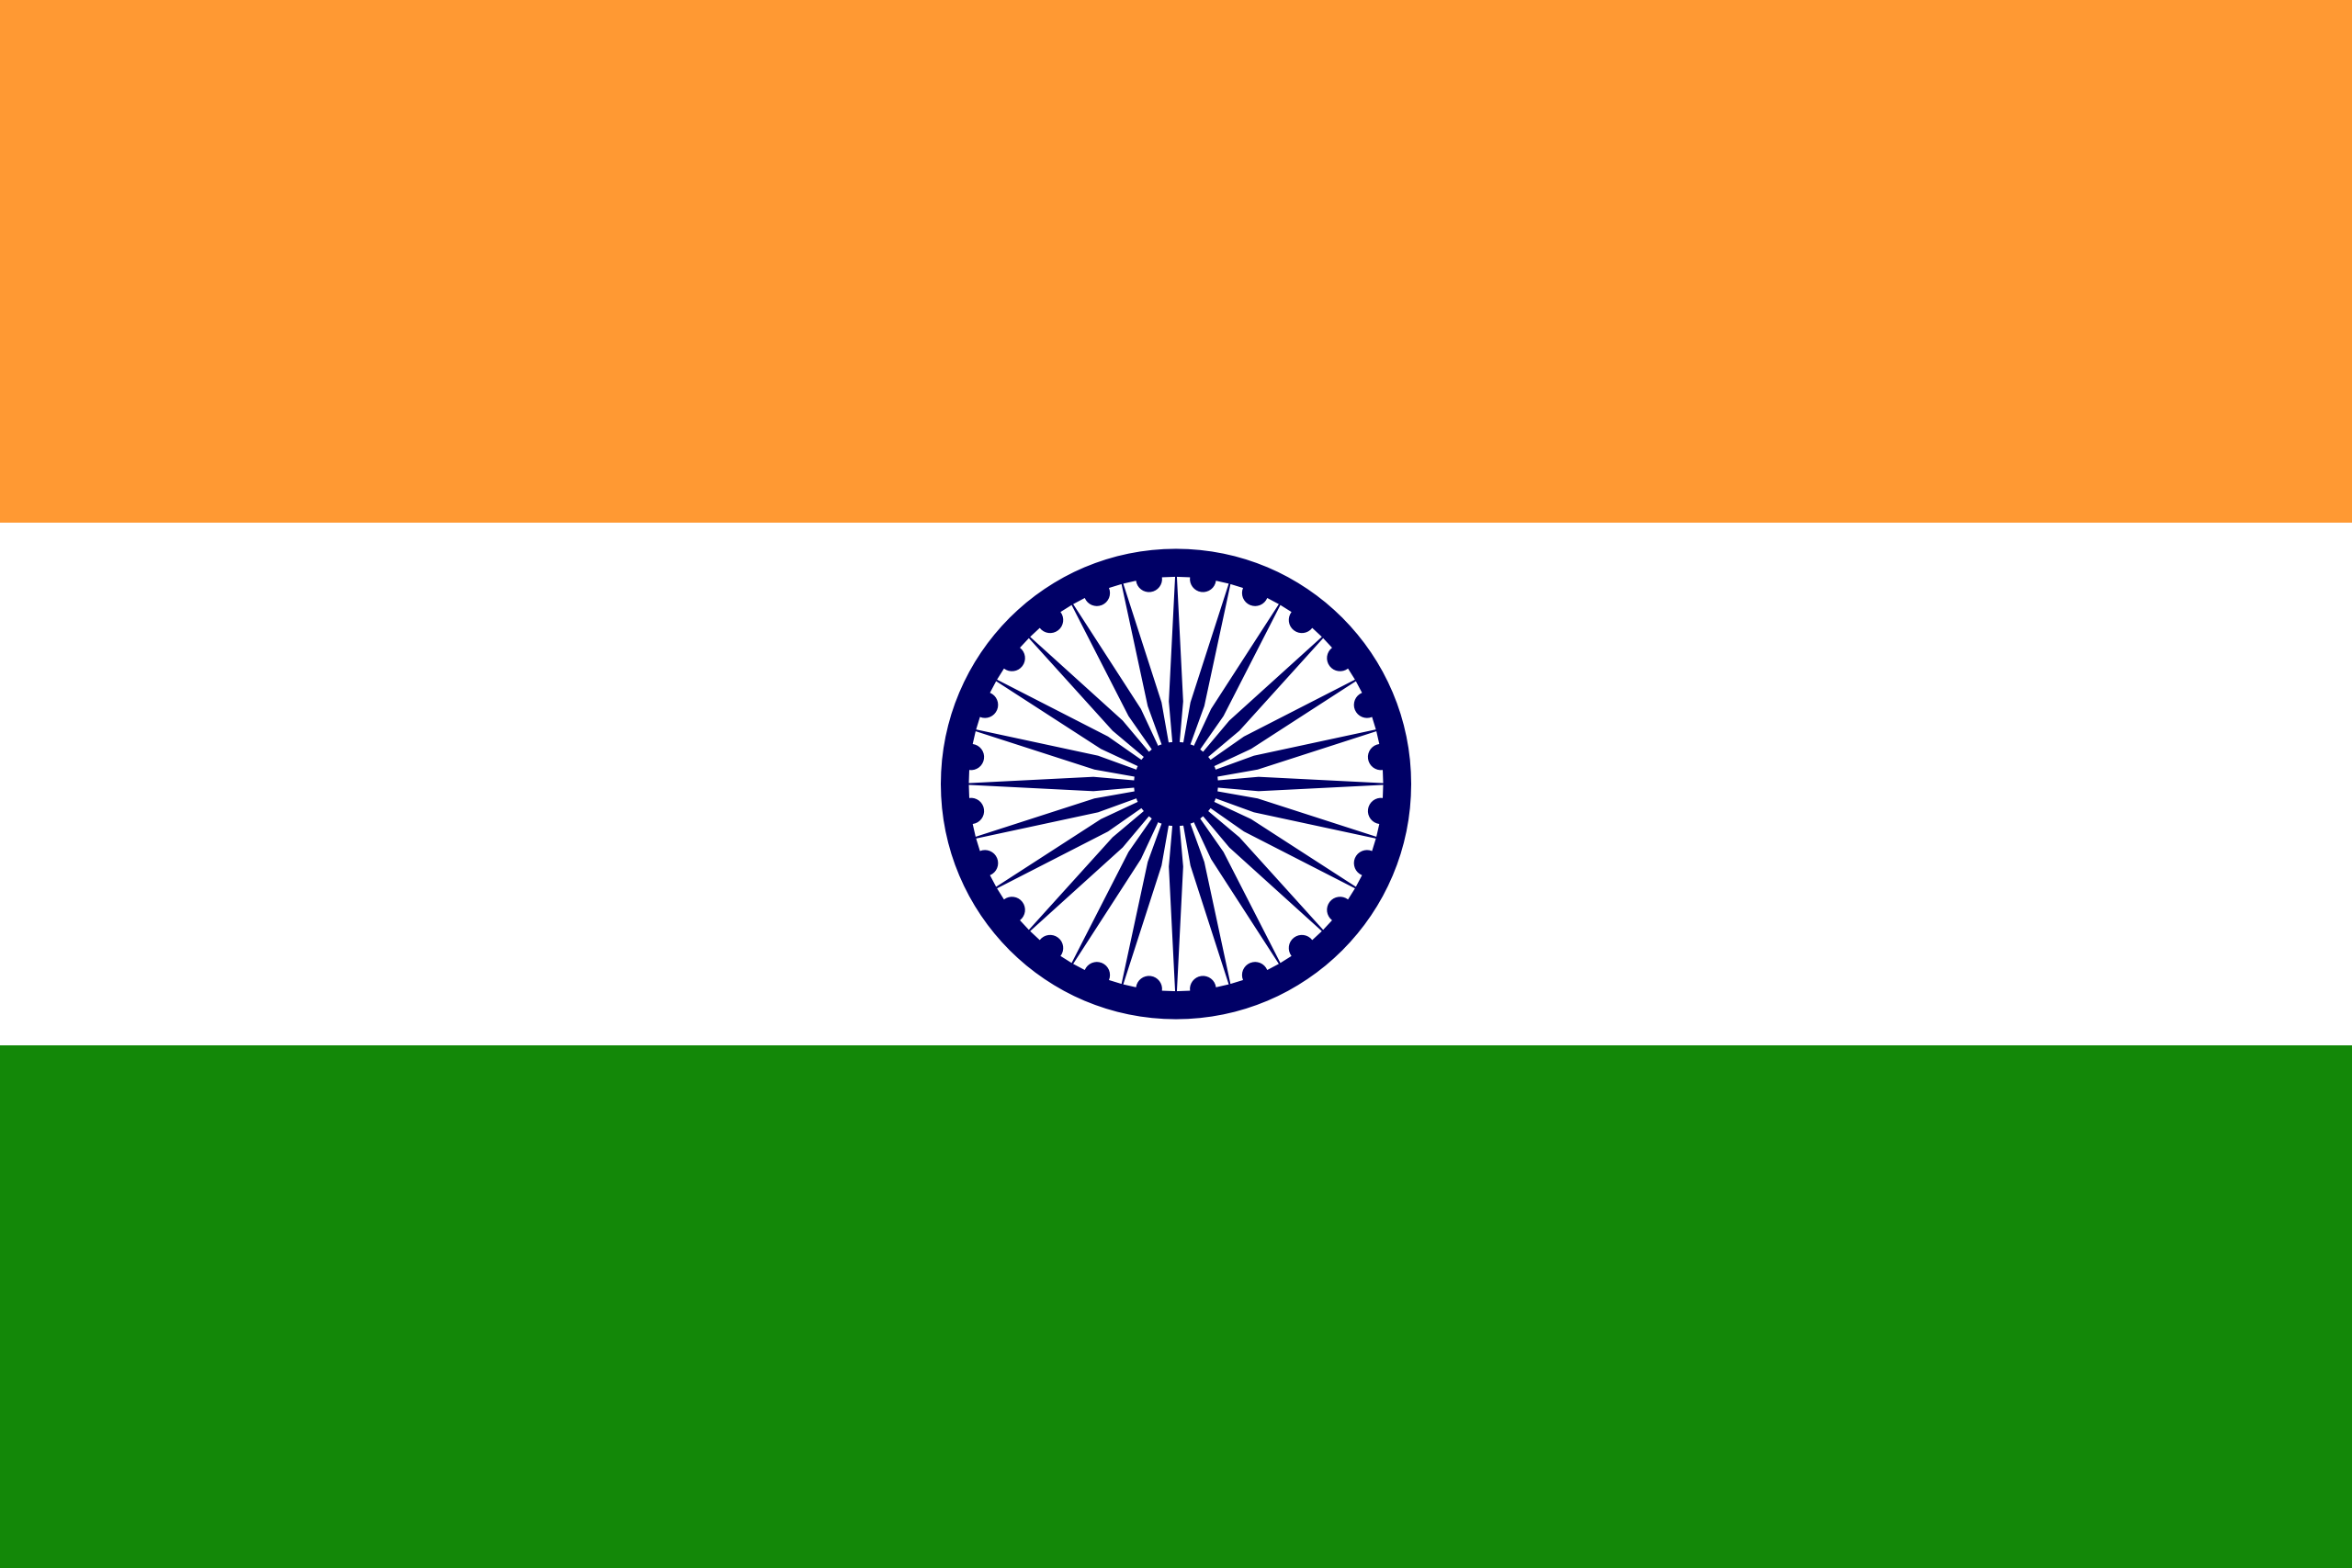 India, paese, emblema, logo, simbolo - Sfondi HD - Professor-falken.com